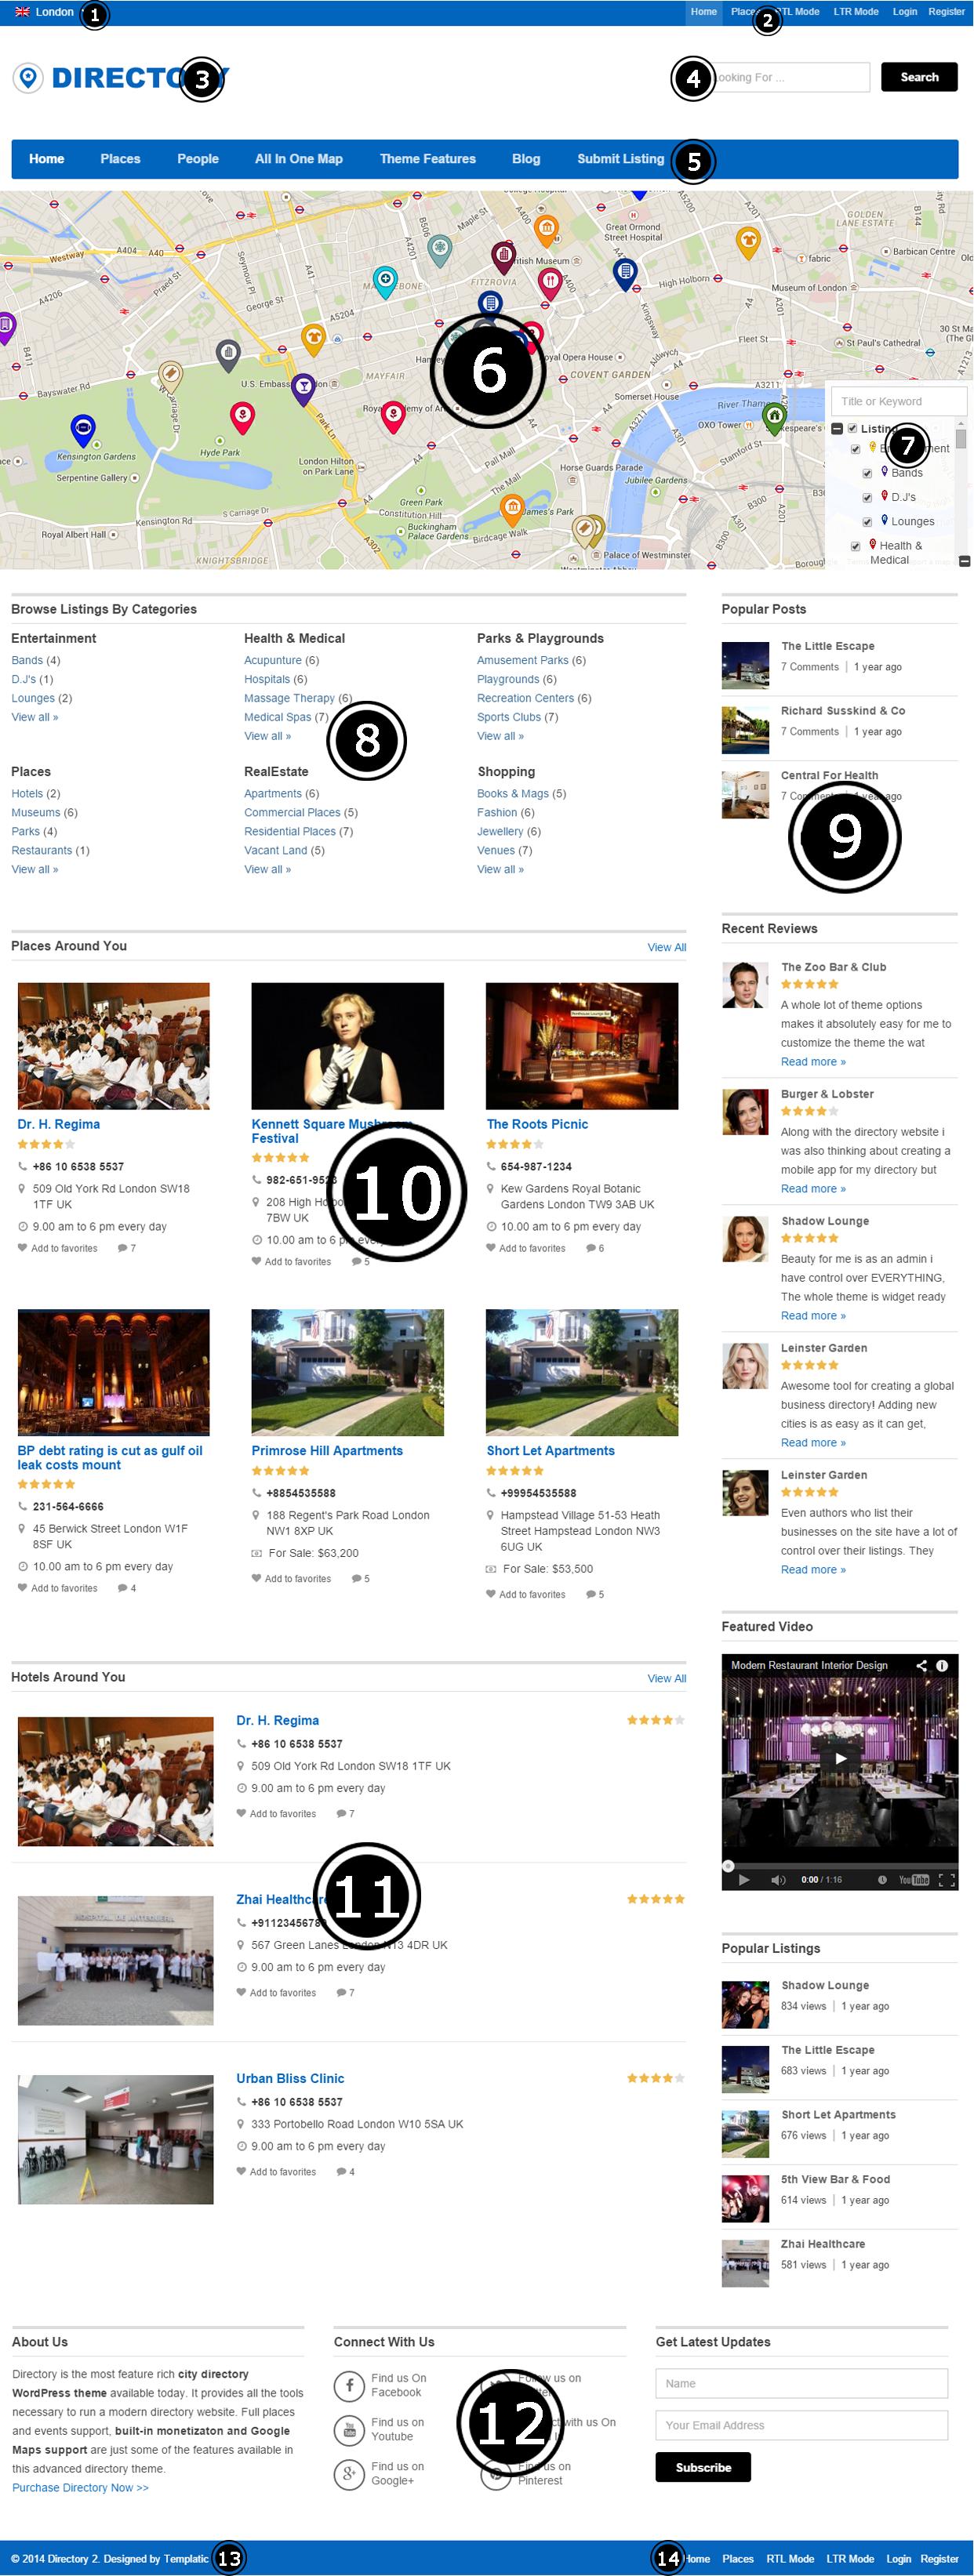 d_homepage